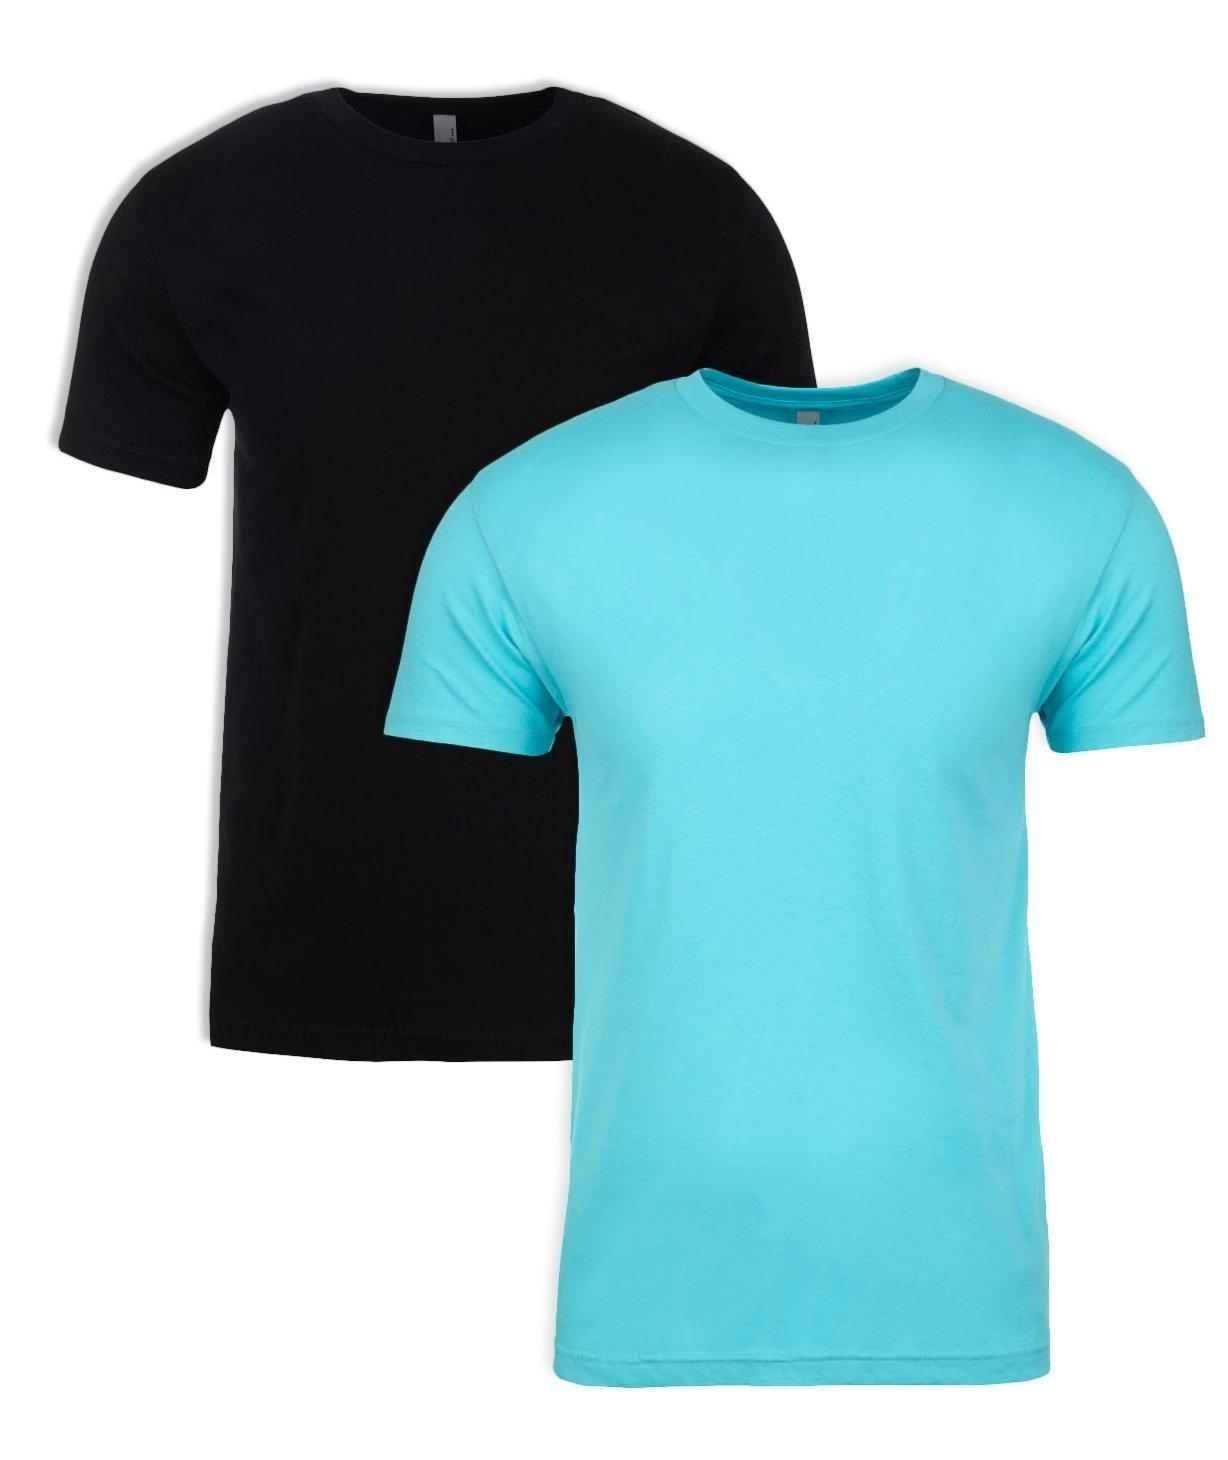 Next Level Apparel メンズ CVC クルーネック ジャージ Tシャツ B07D1D4V9P Medium|Black + Tahiti Blue (2 Pack) Black + Tahiti Blue (2 Pack) Medium